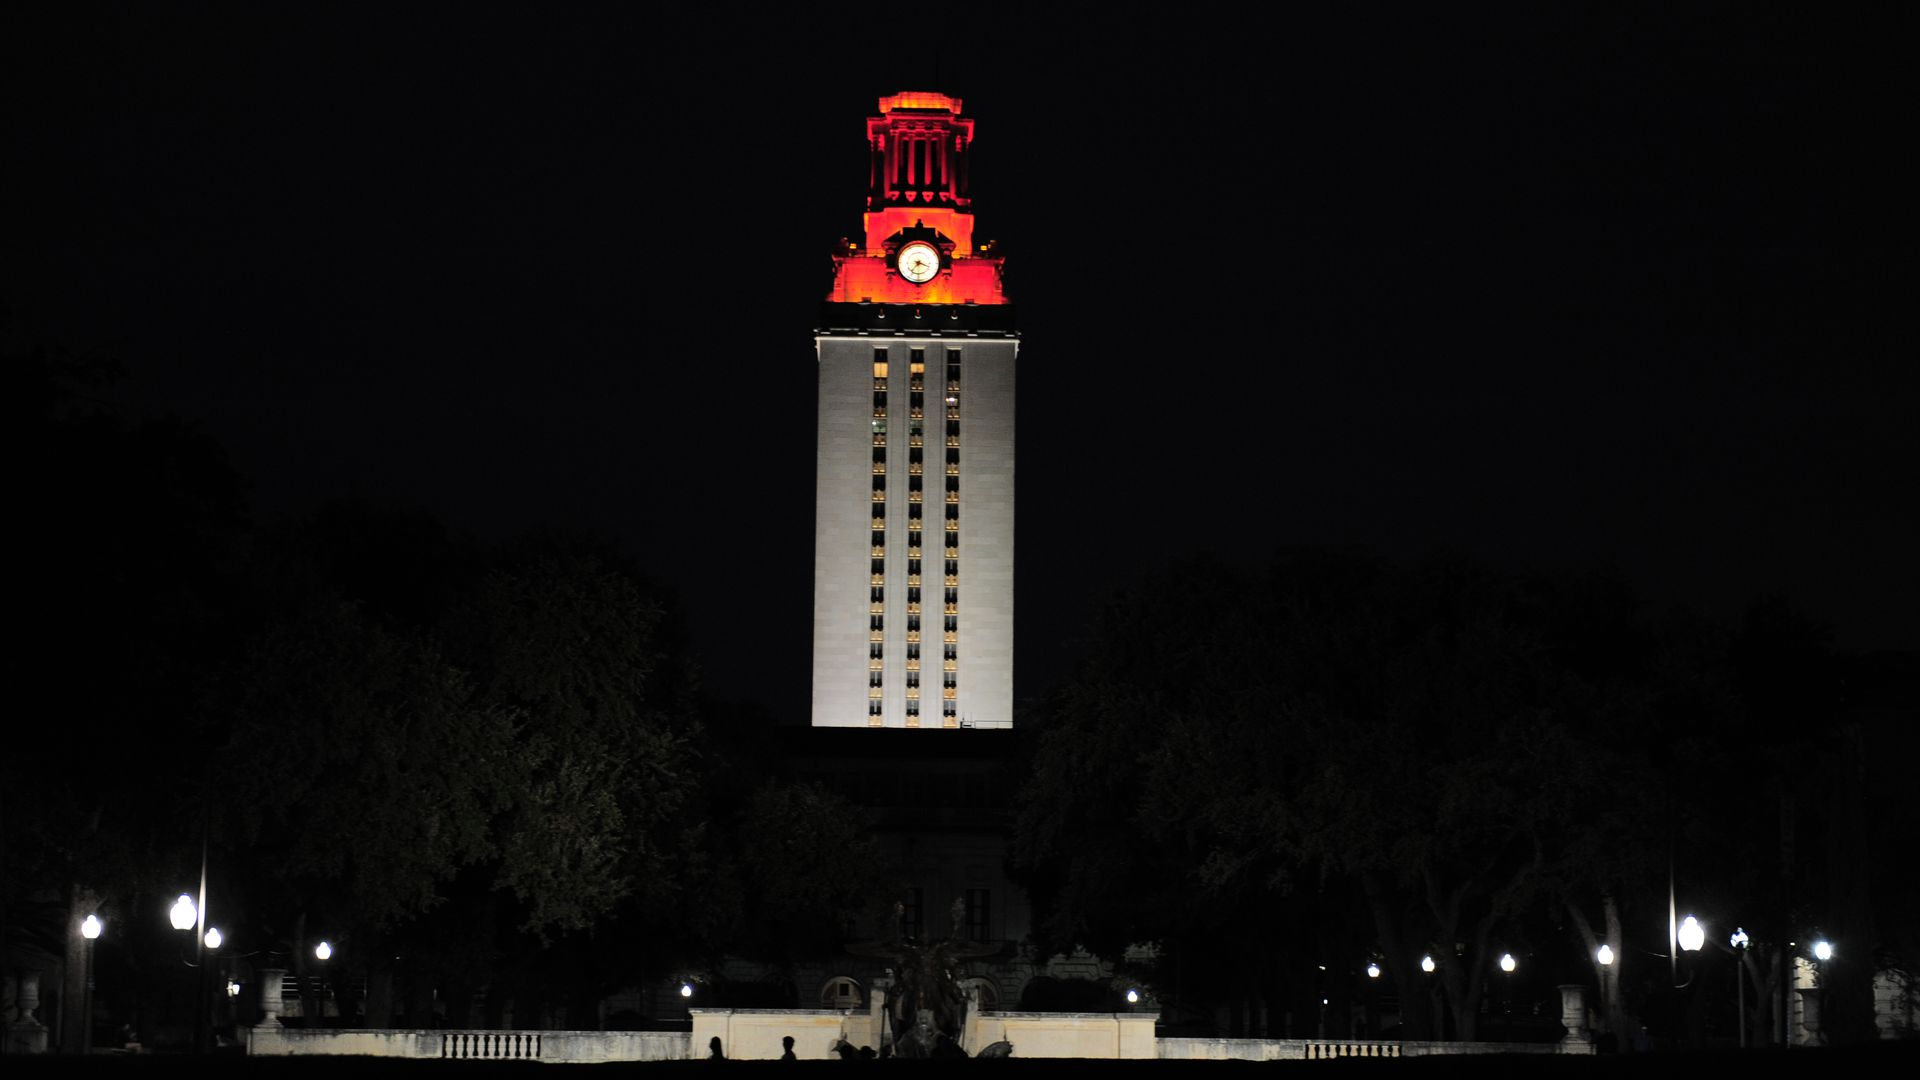 The University of Texas tower shines burnt orange at night.